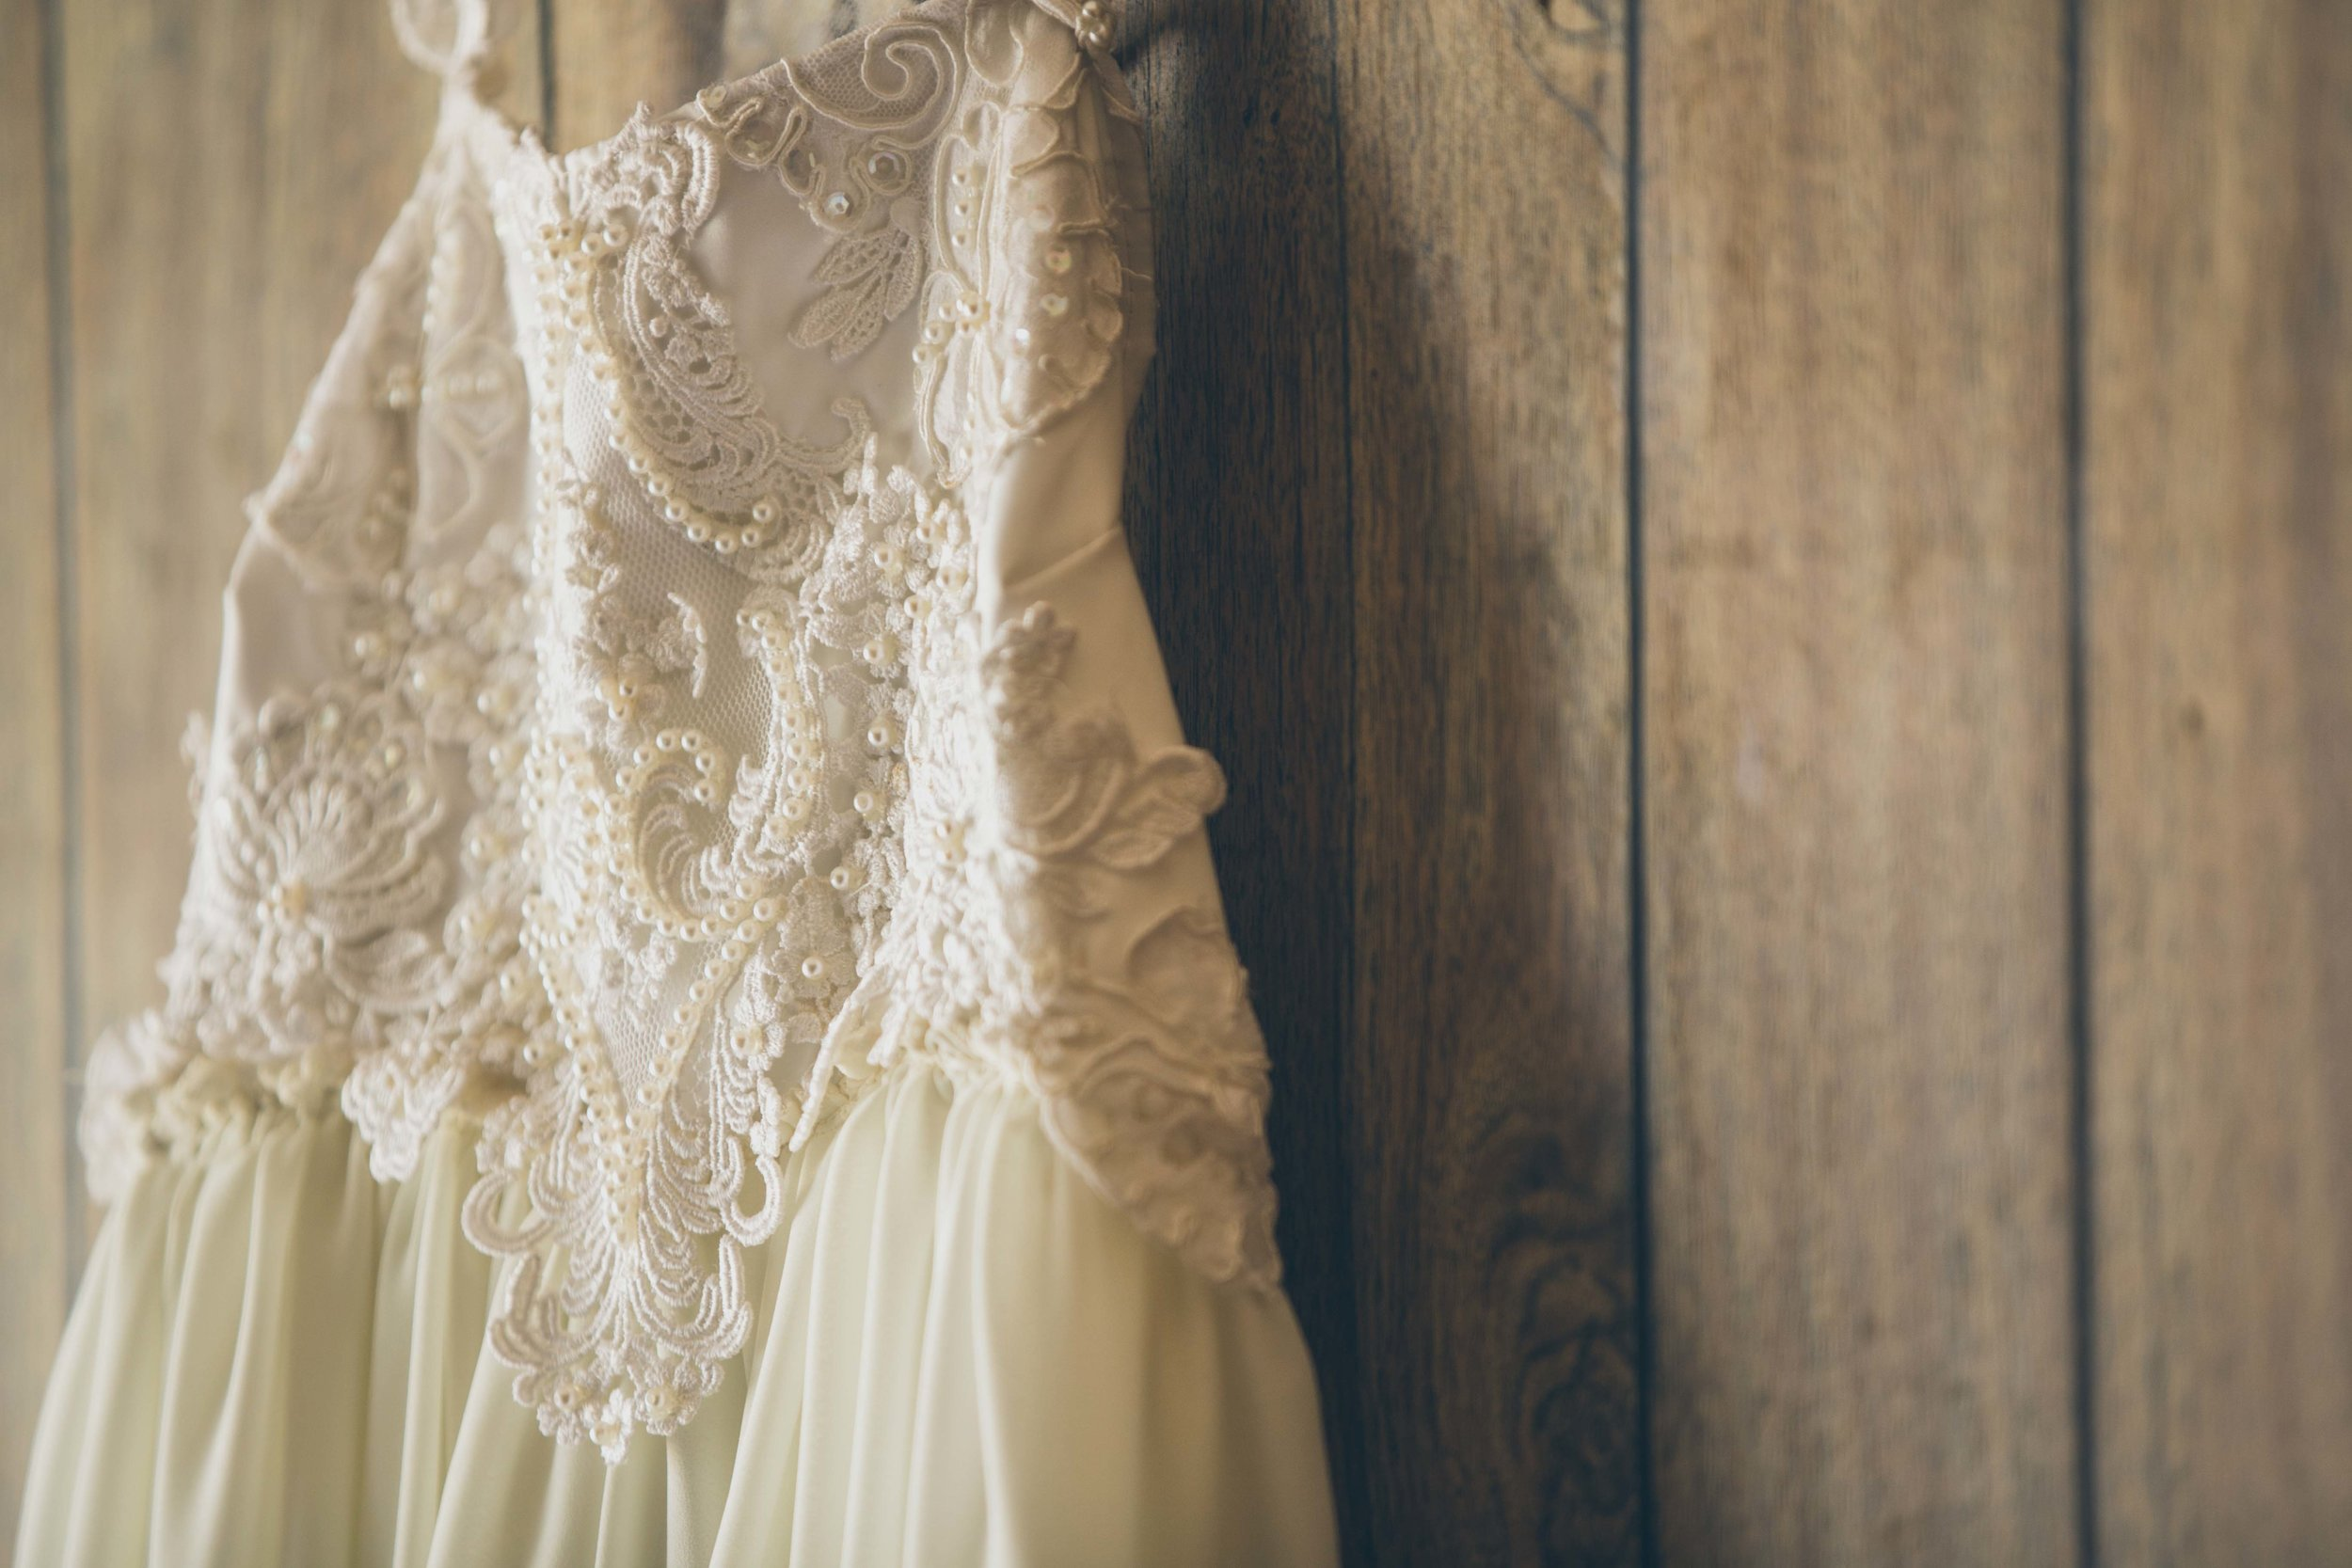 20141024-DePartee-Wedding-APavone-002-sm.jpg